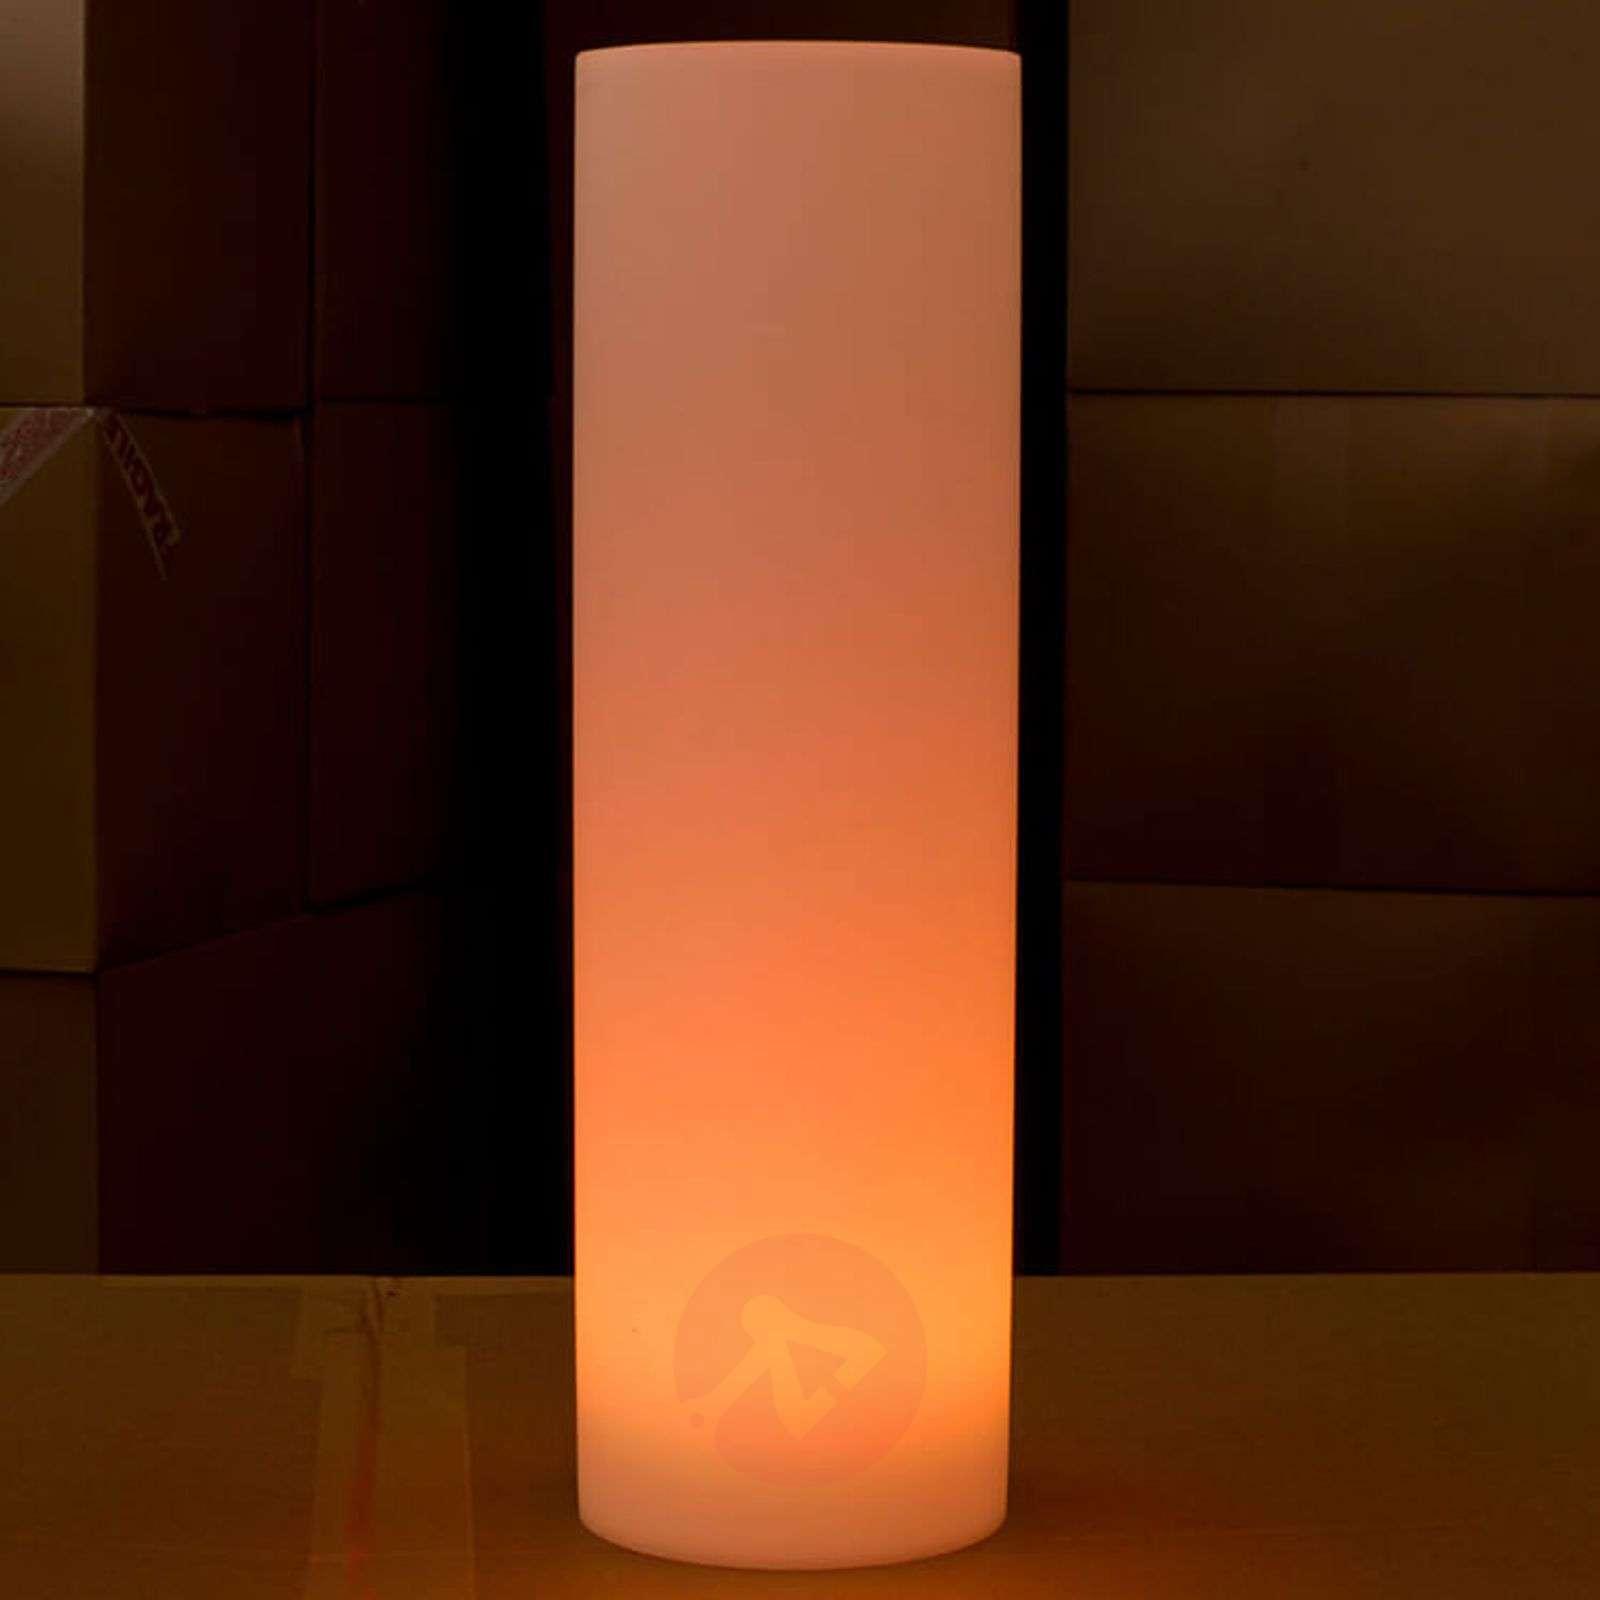 Tower LED decorative light, controllable via app-8590023-01